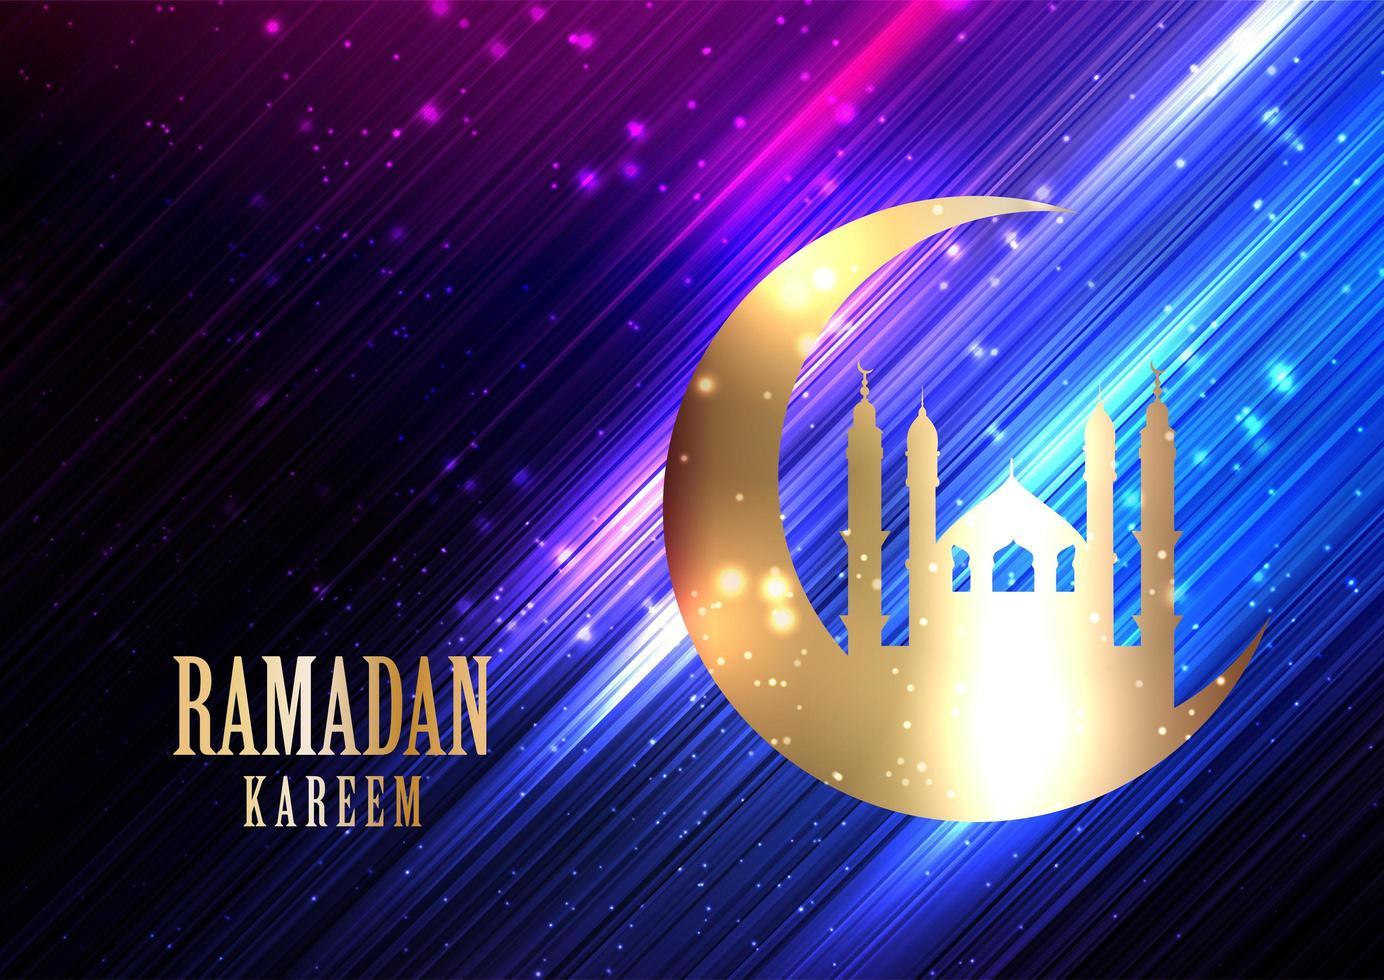 Ramadan Kareem background with Glowing Lights vector